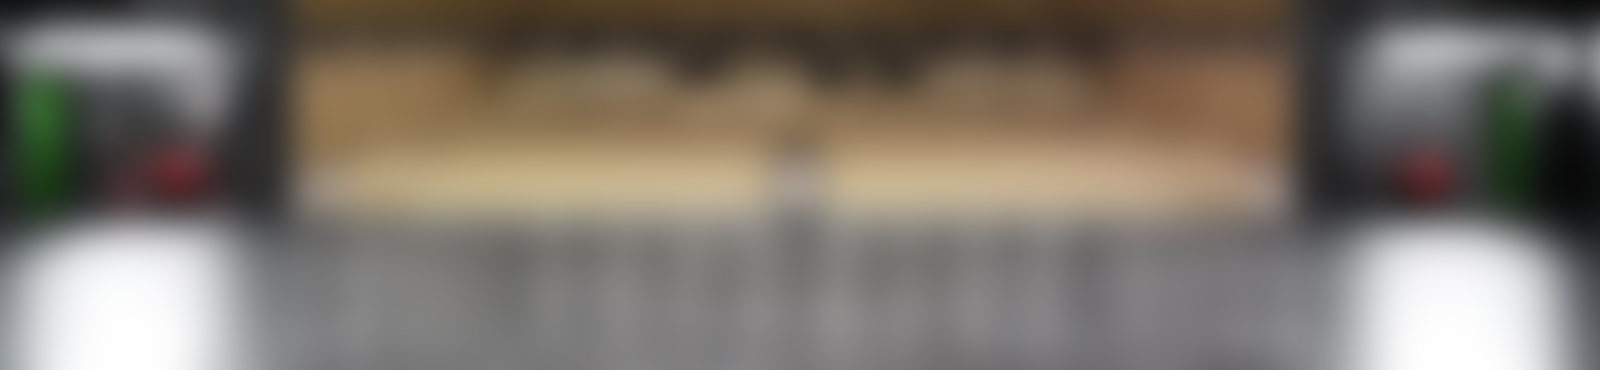 Blurred berliner festspiele stage farbe  c  christian riis ruggaber